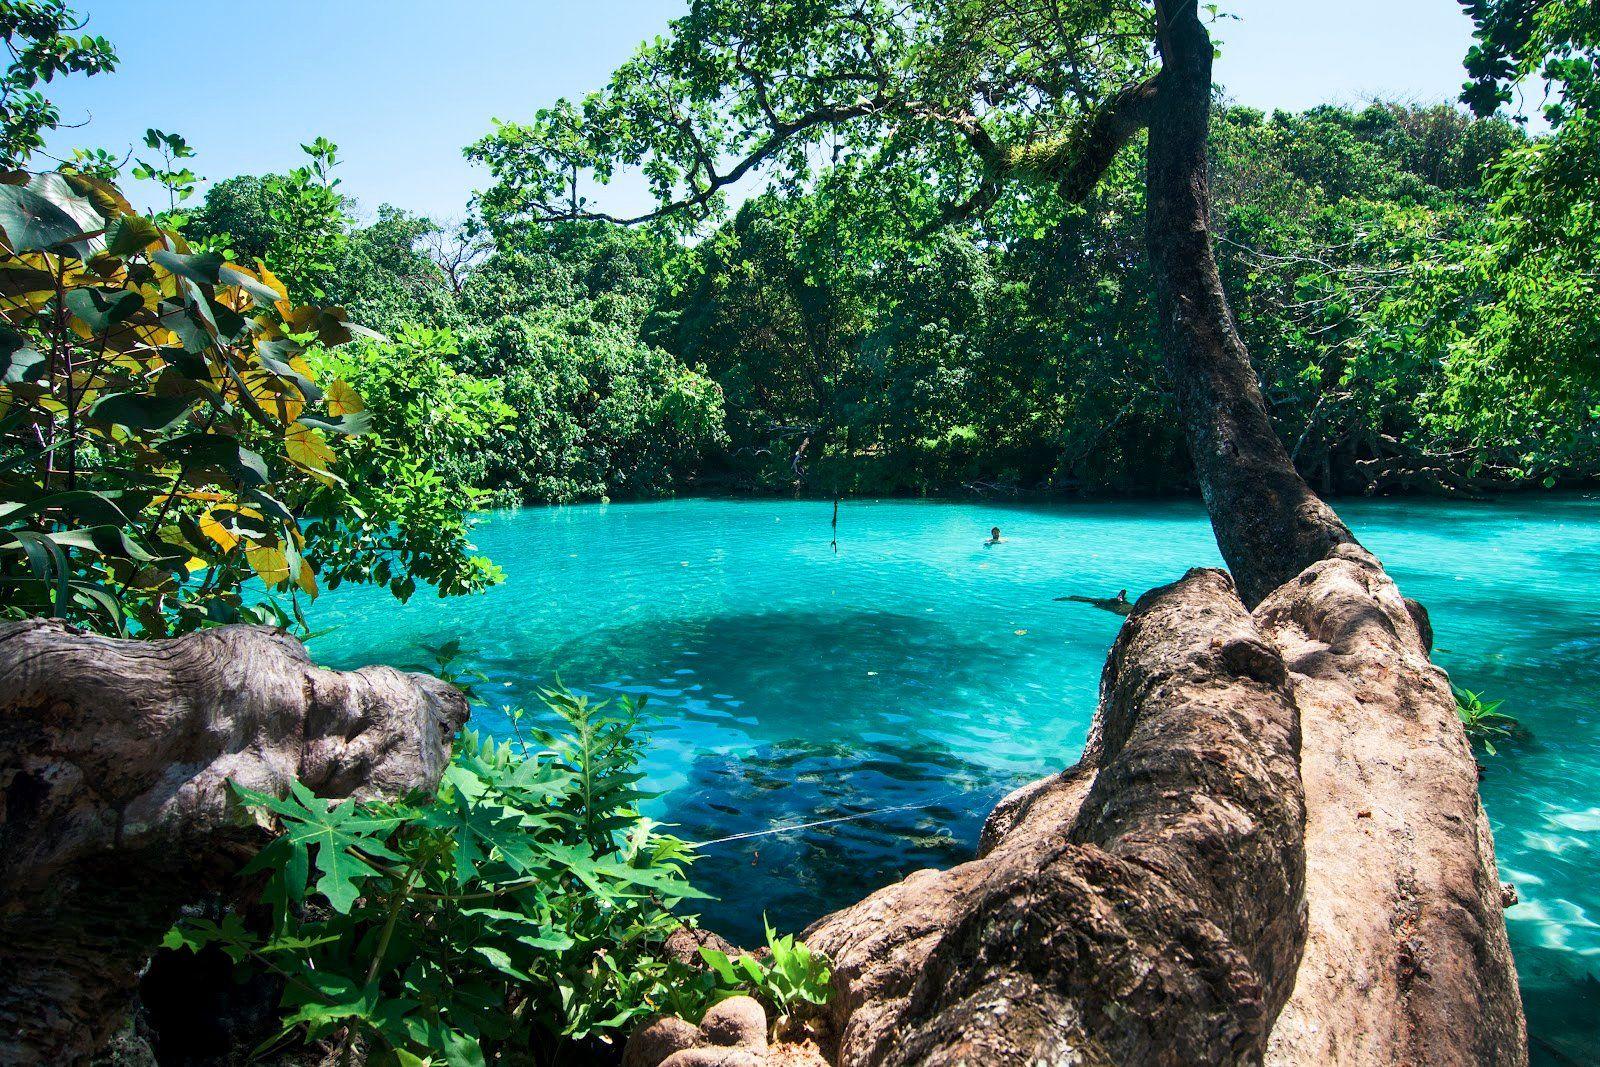 Blue Lagoon Port Antonio Jamaica Top Tips Before You Go